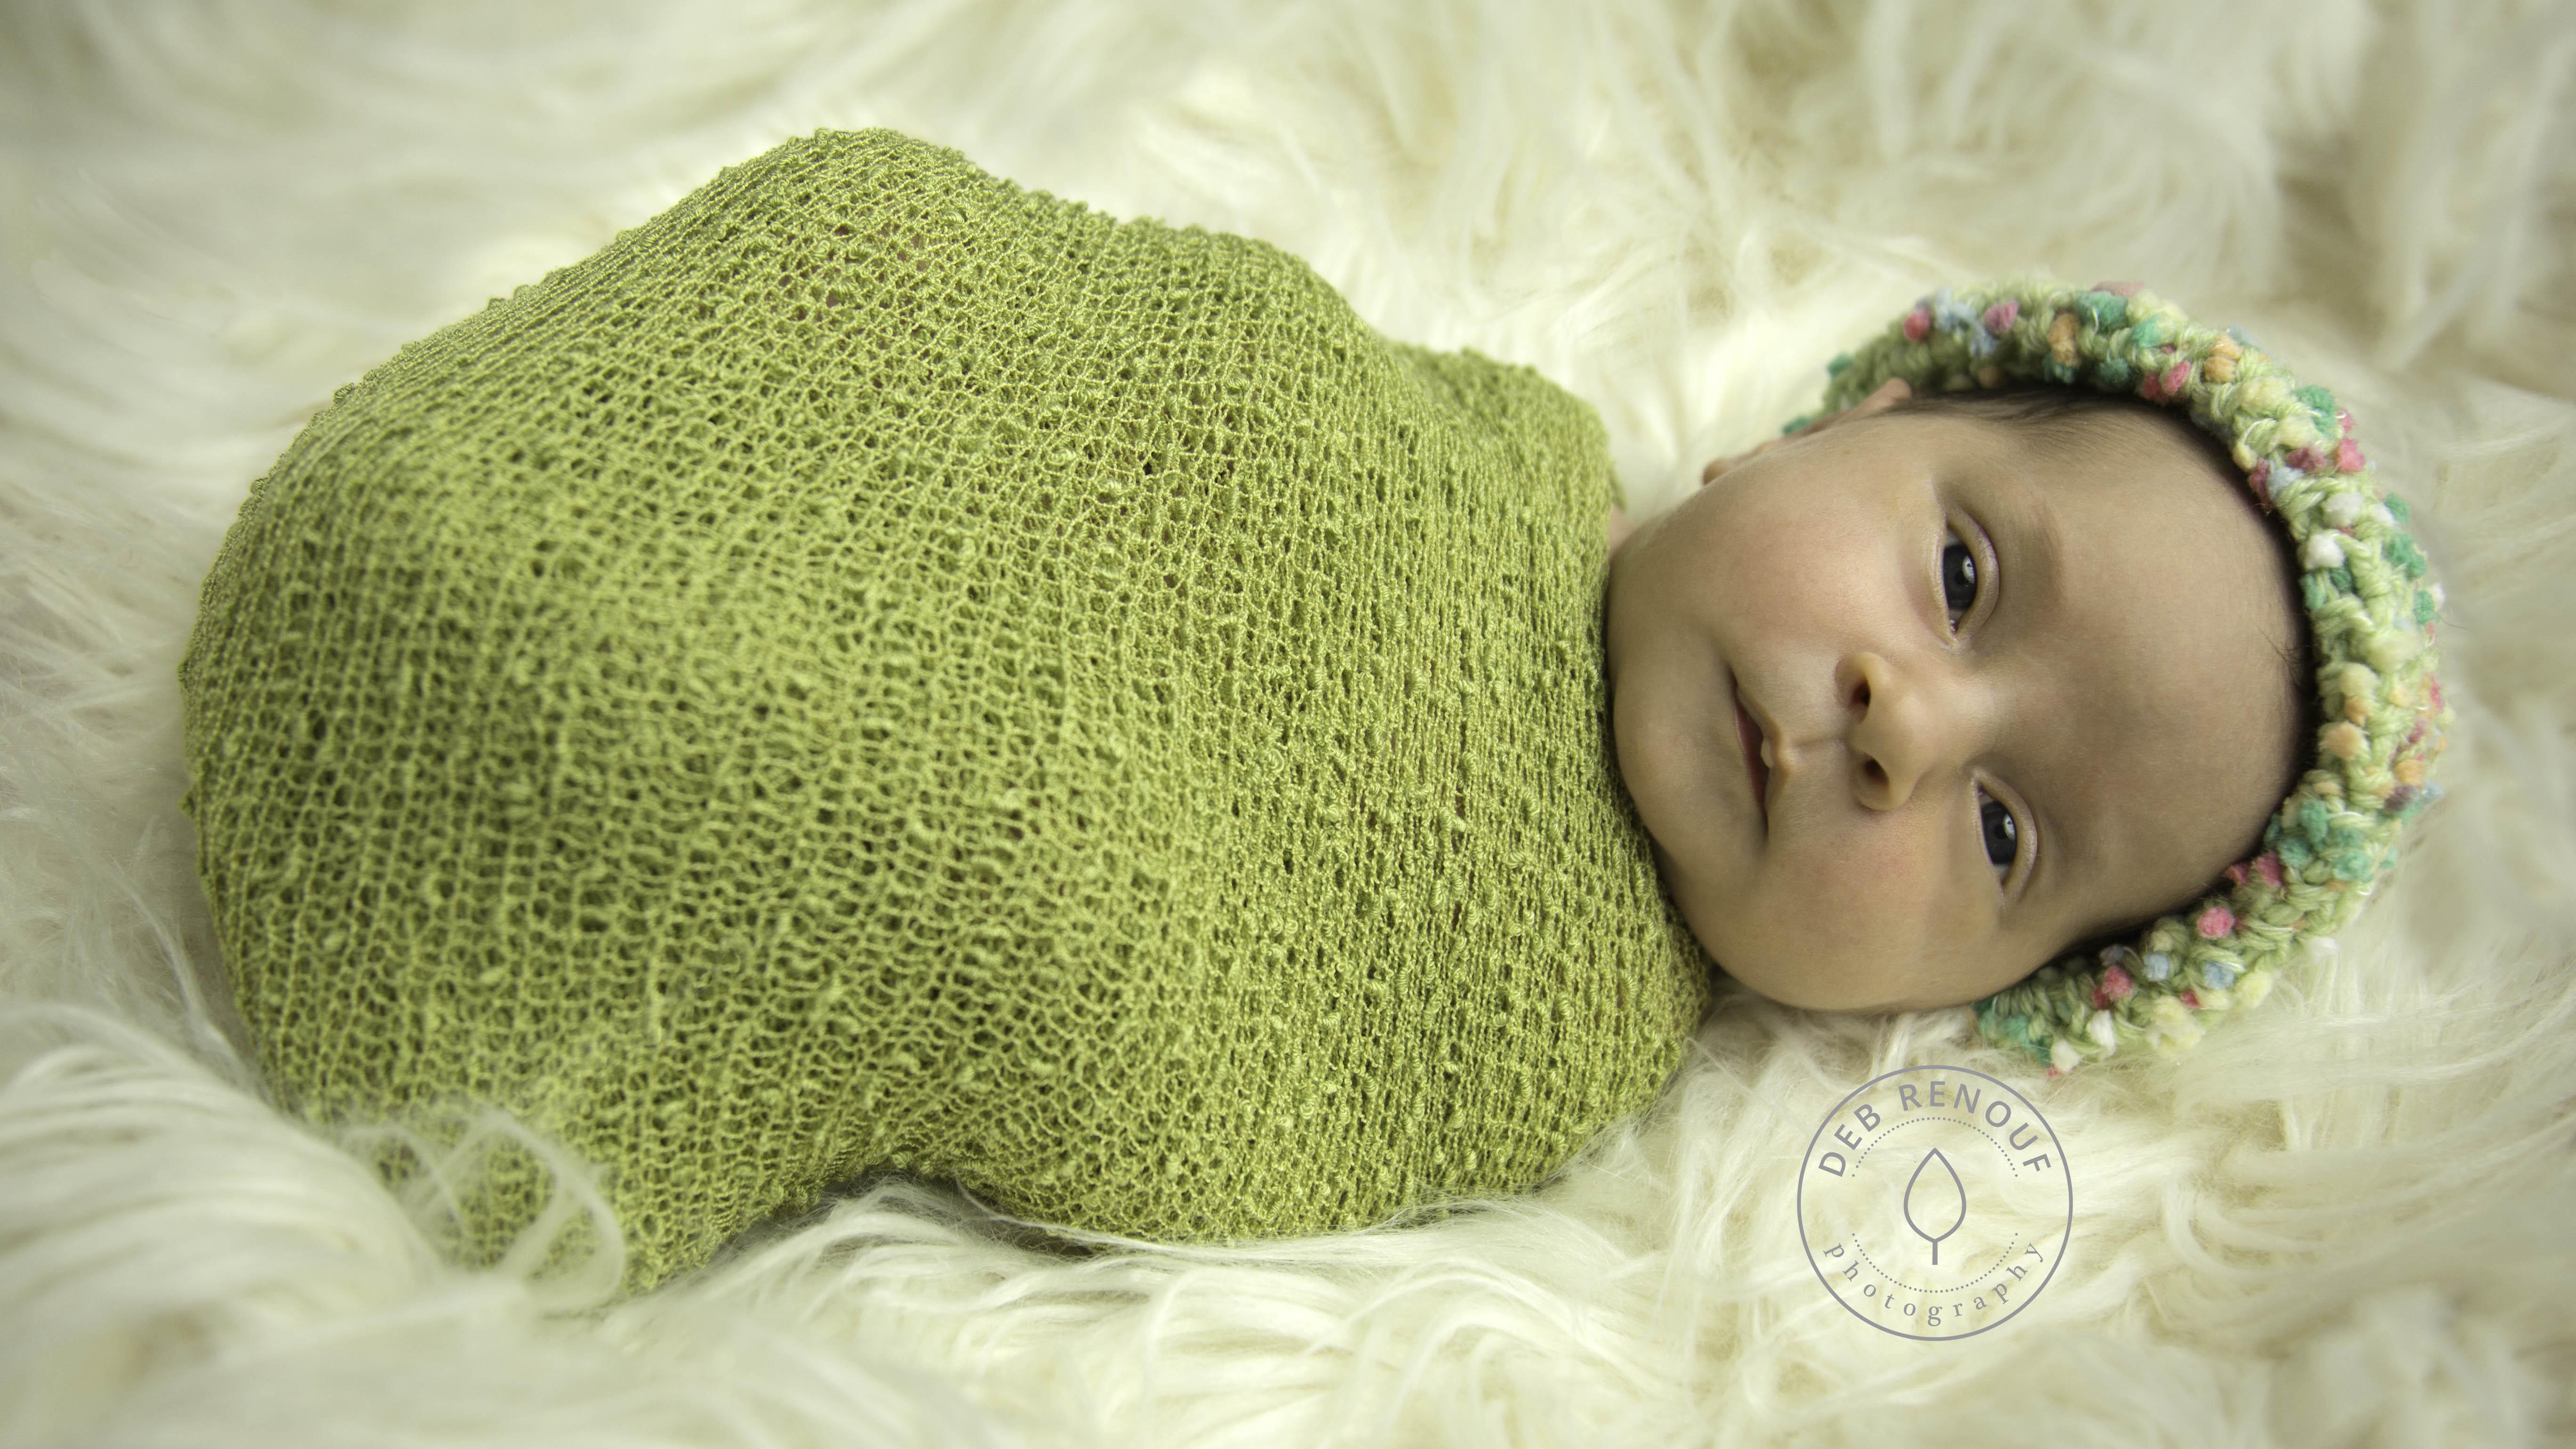 Baby_greenwrap_site